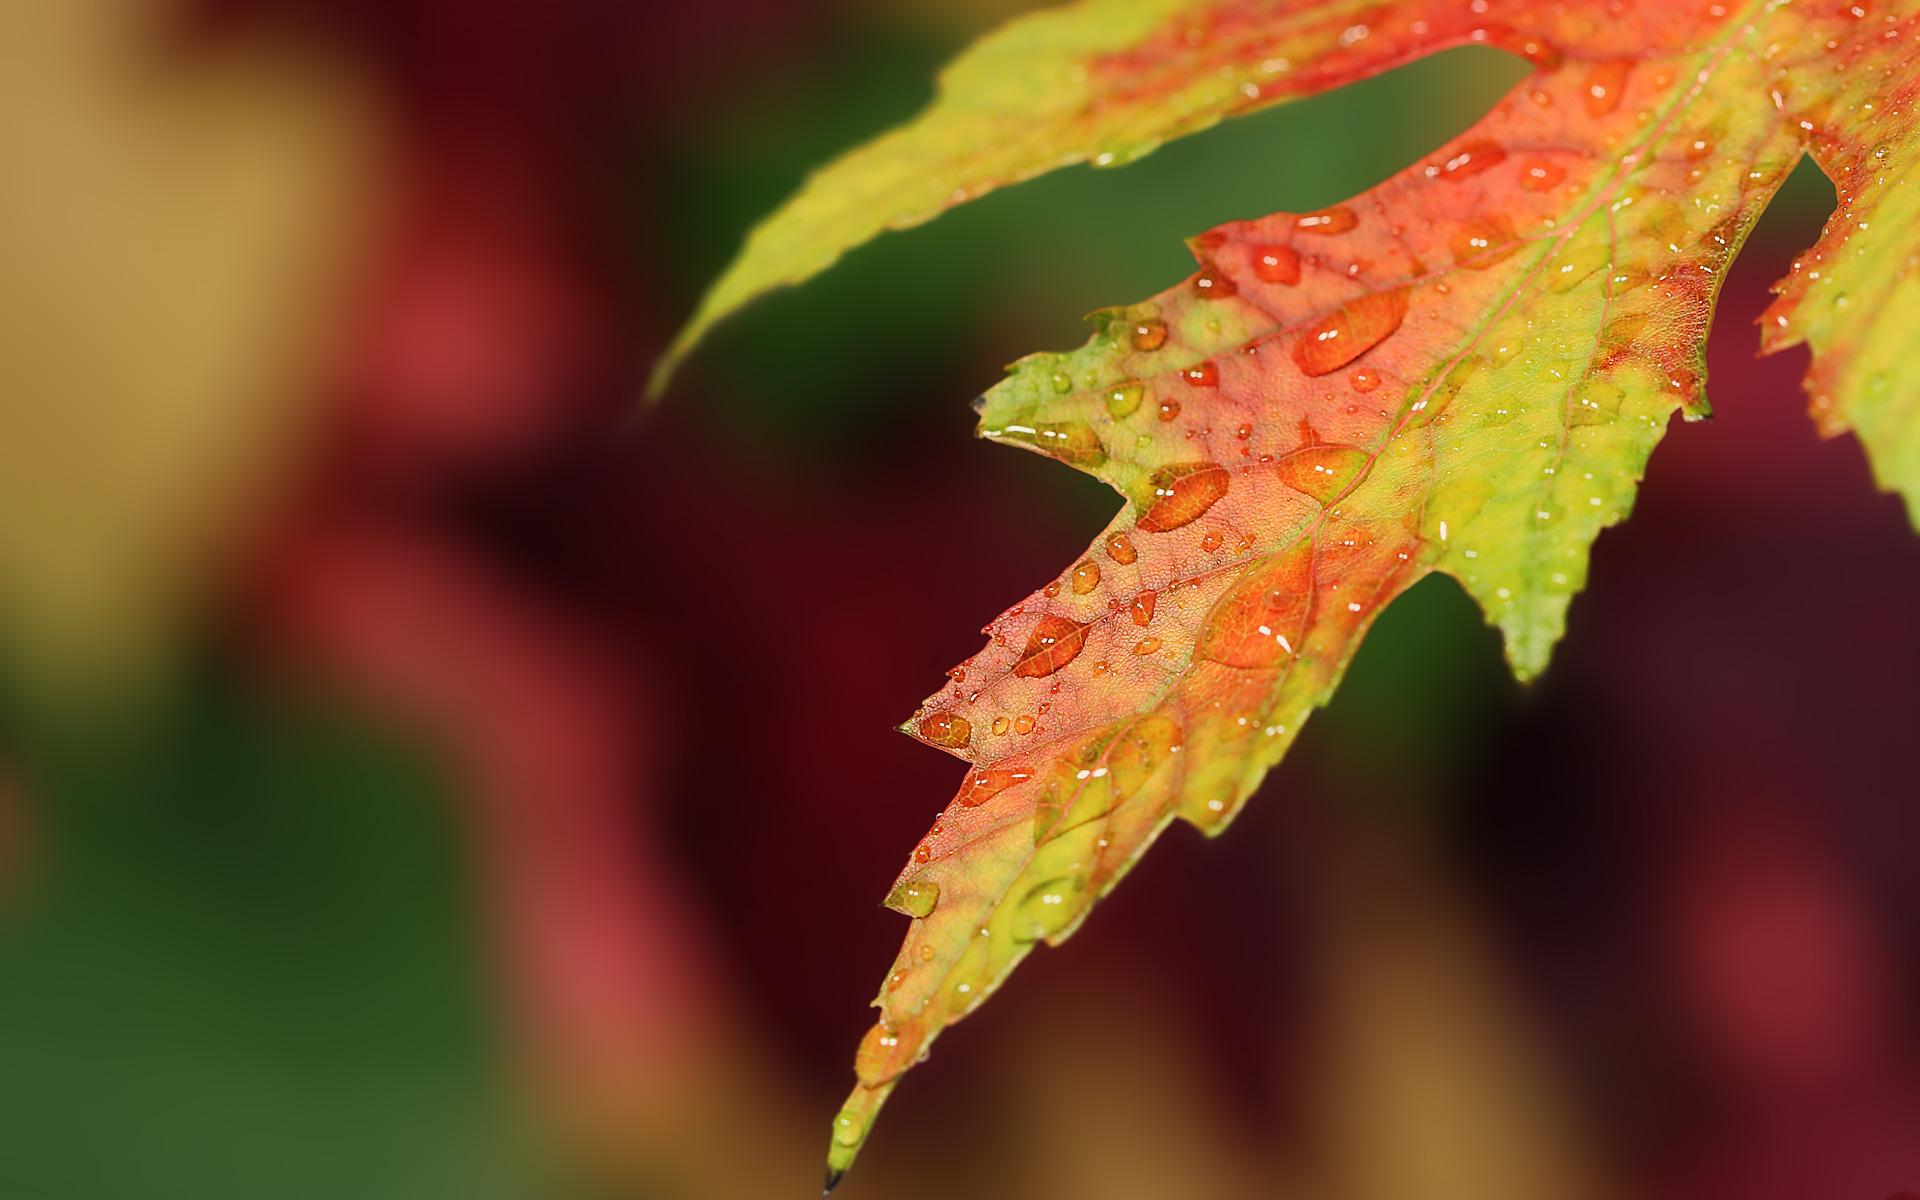 Fall Hd Wallpapers 1080p Widescreen Fall Wallpapers Hd Pixelstalk Net